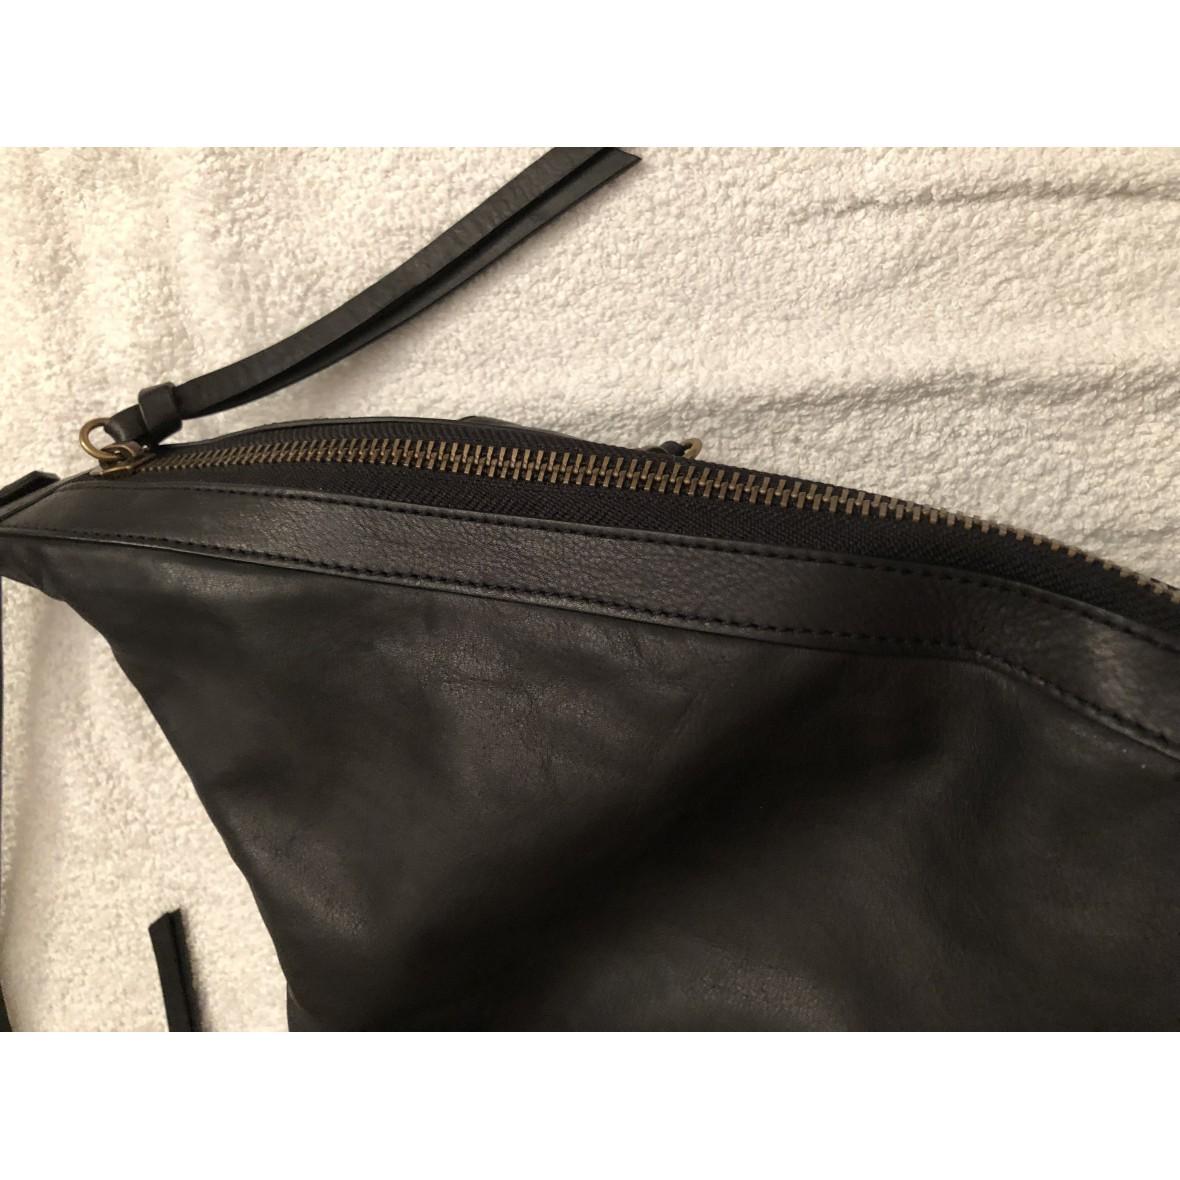 022ef20c6eccb JOELLE HAWKENS Handtasche. NEU. OUTLET-SALE-